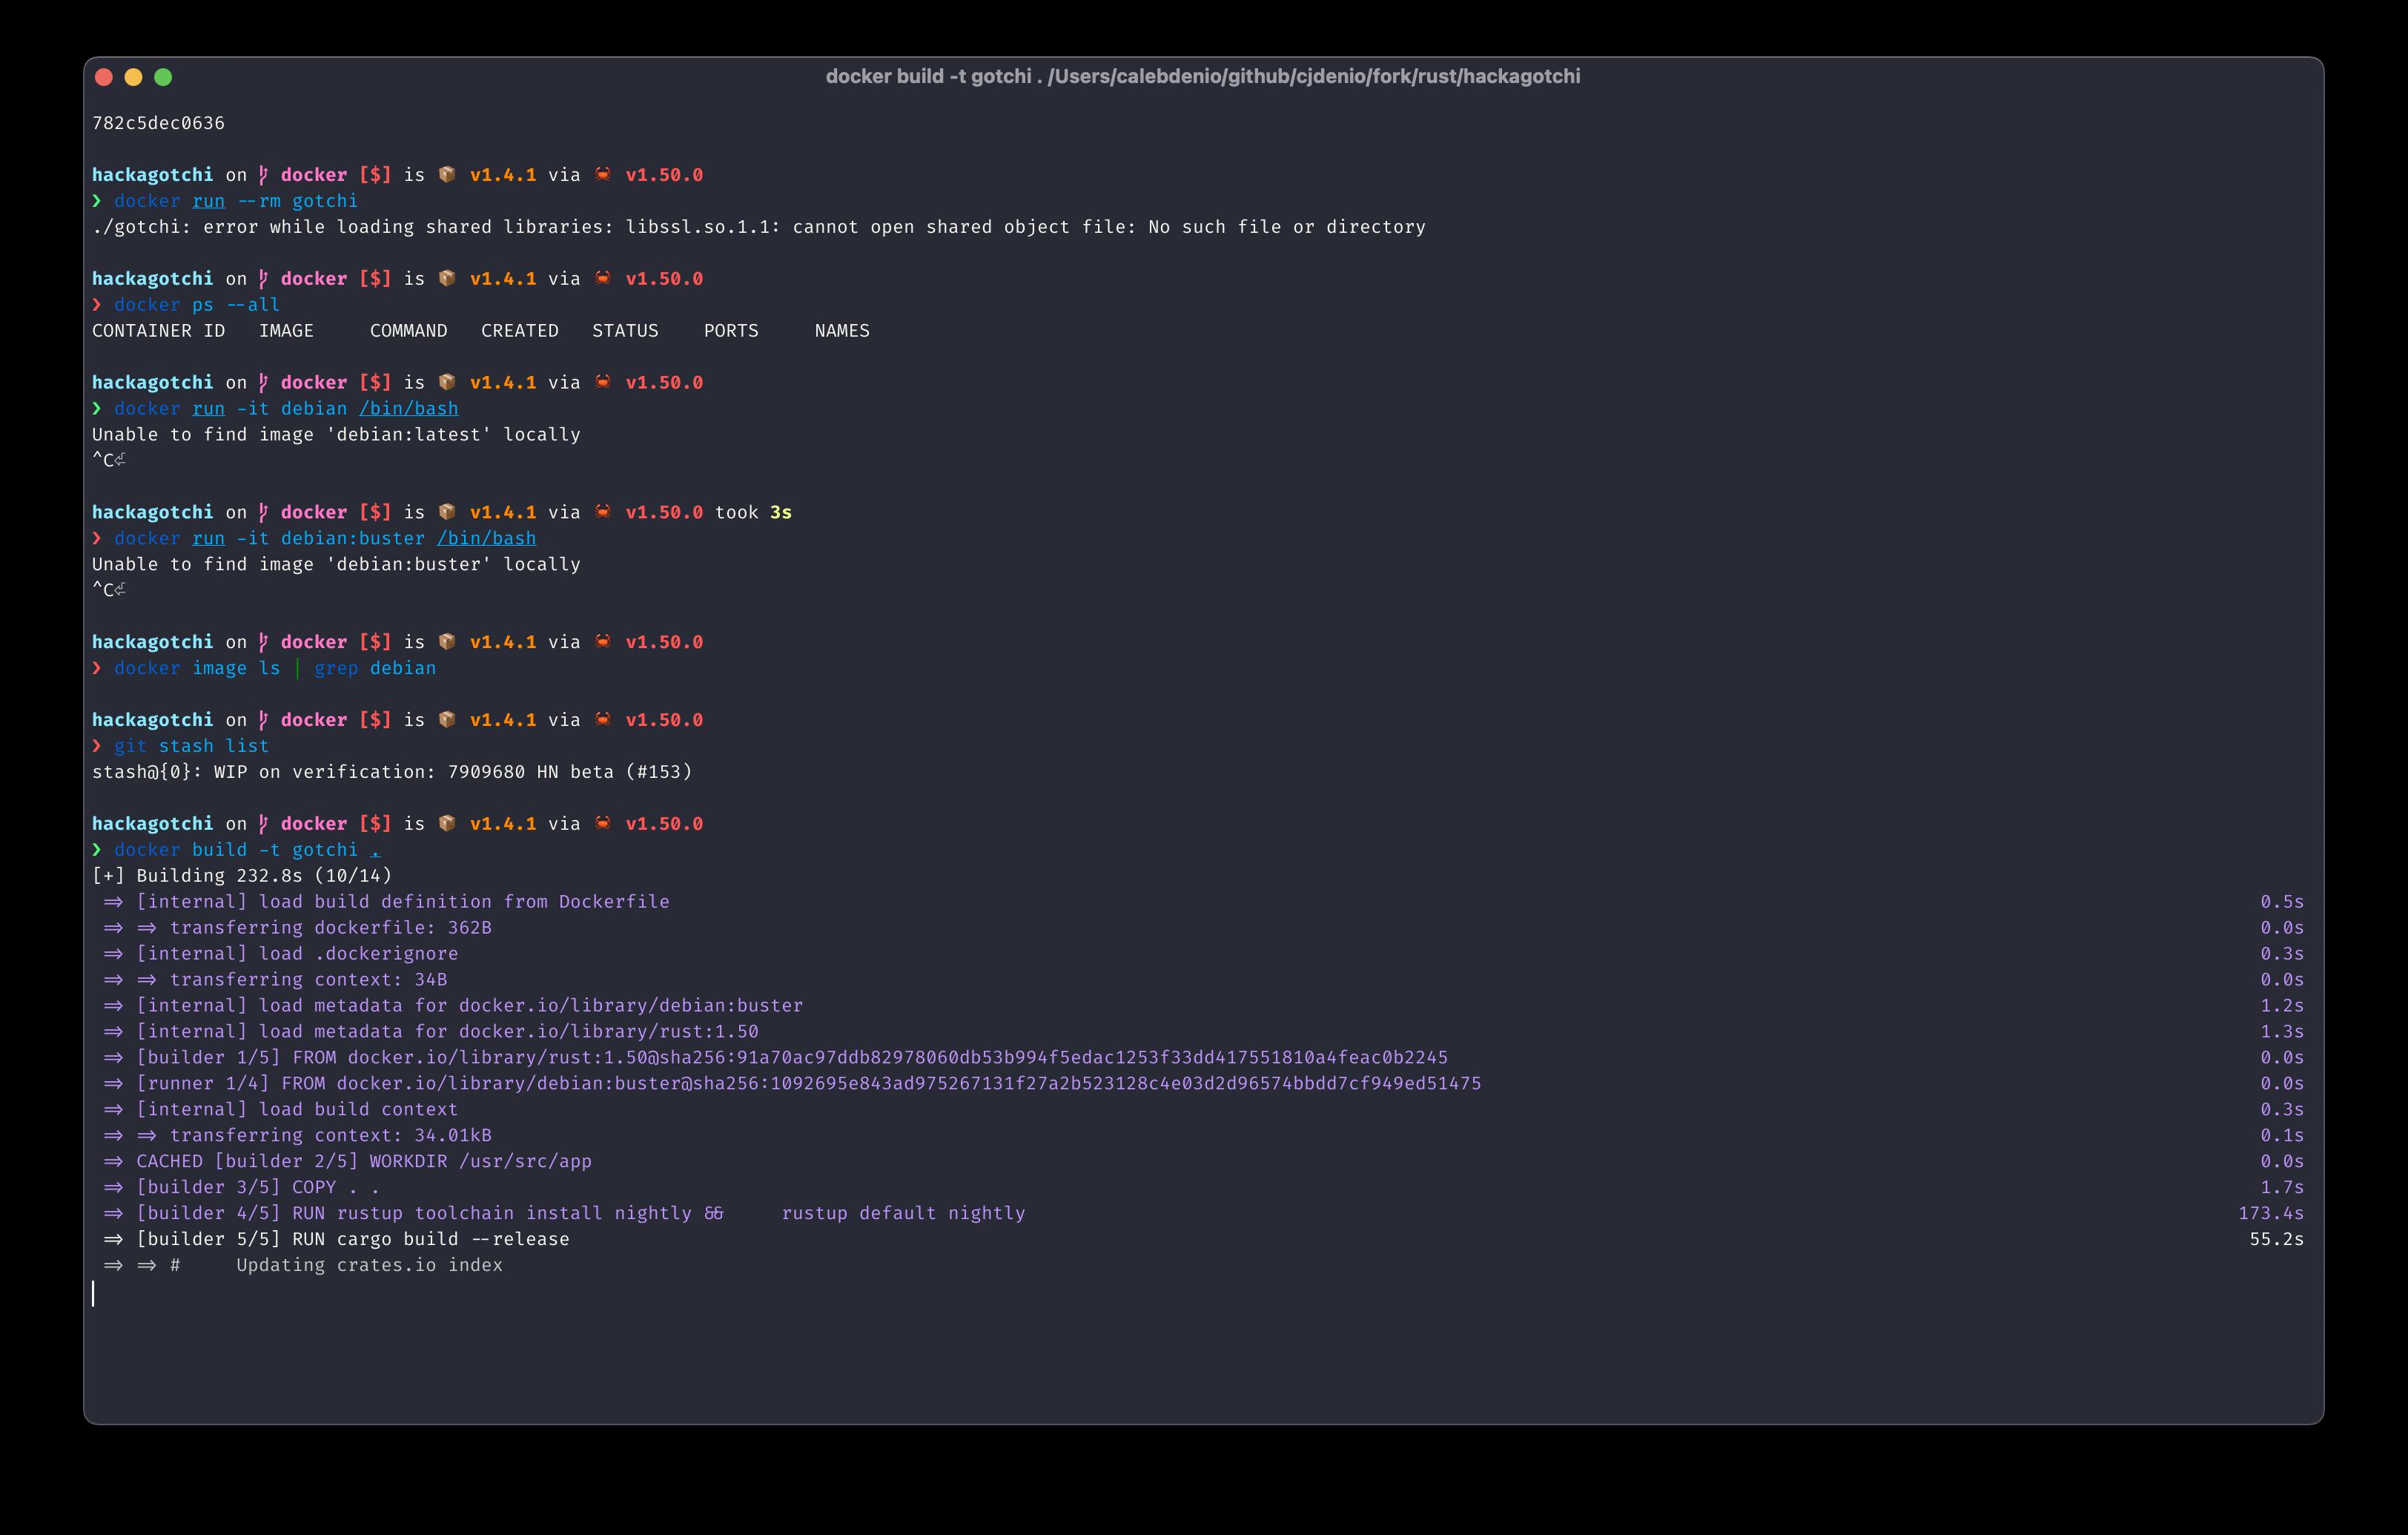 https://cloud-anypo1p49-hack-club-bot.vercel.app/0screen_shot_2021-03-07_at_6.41.46_pm.png